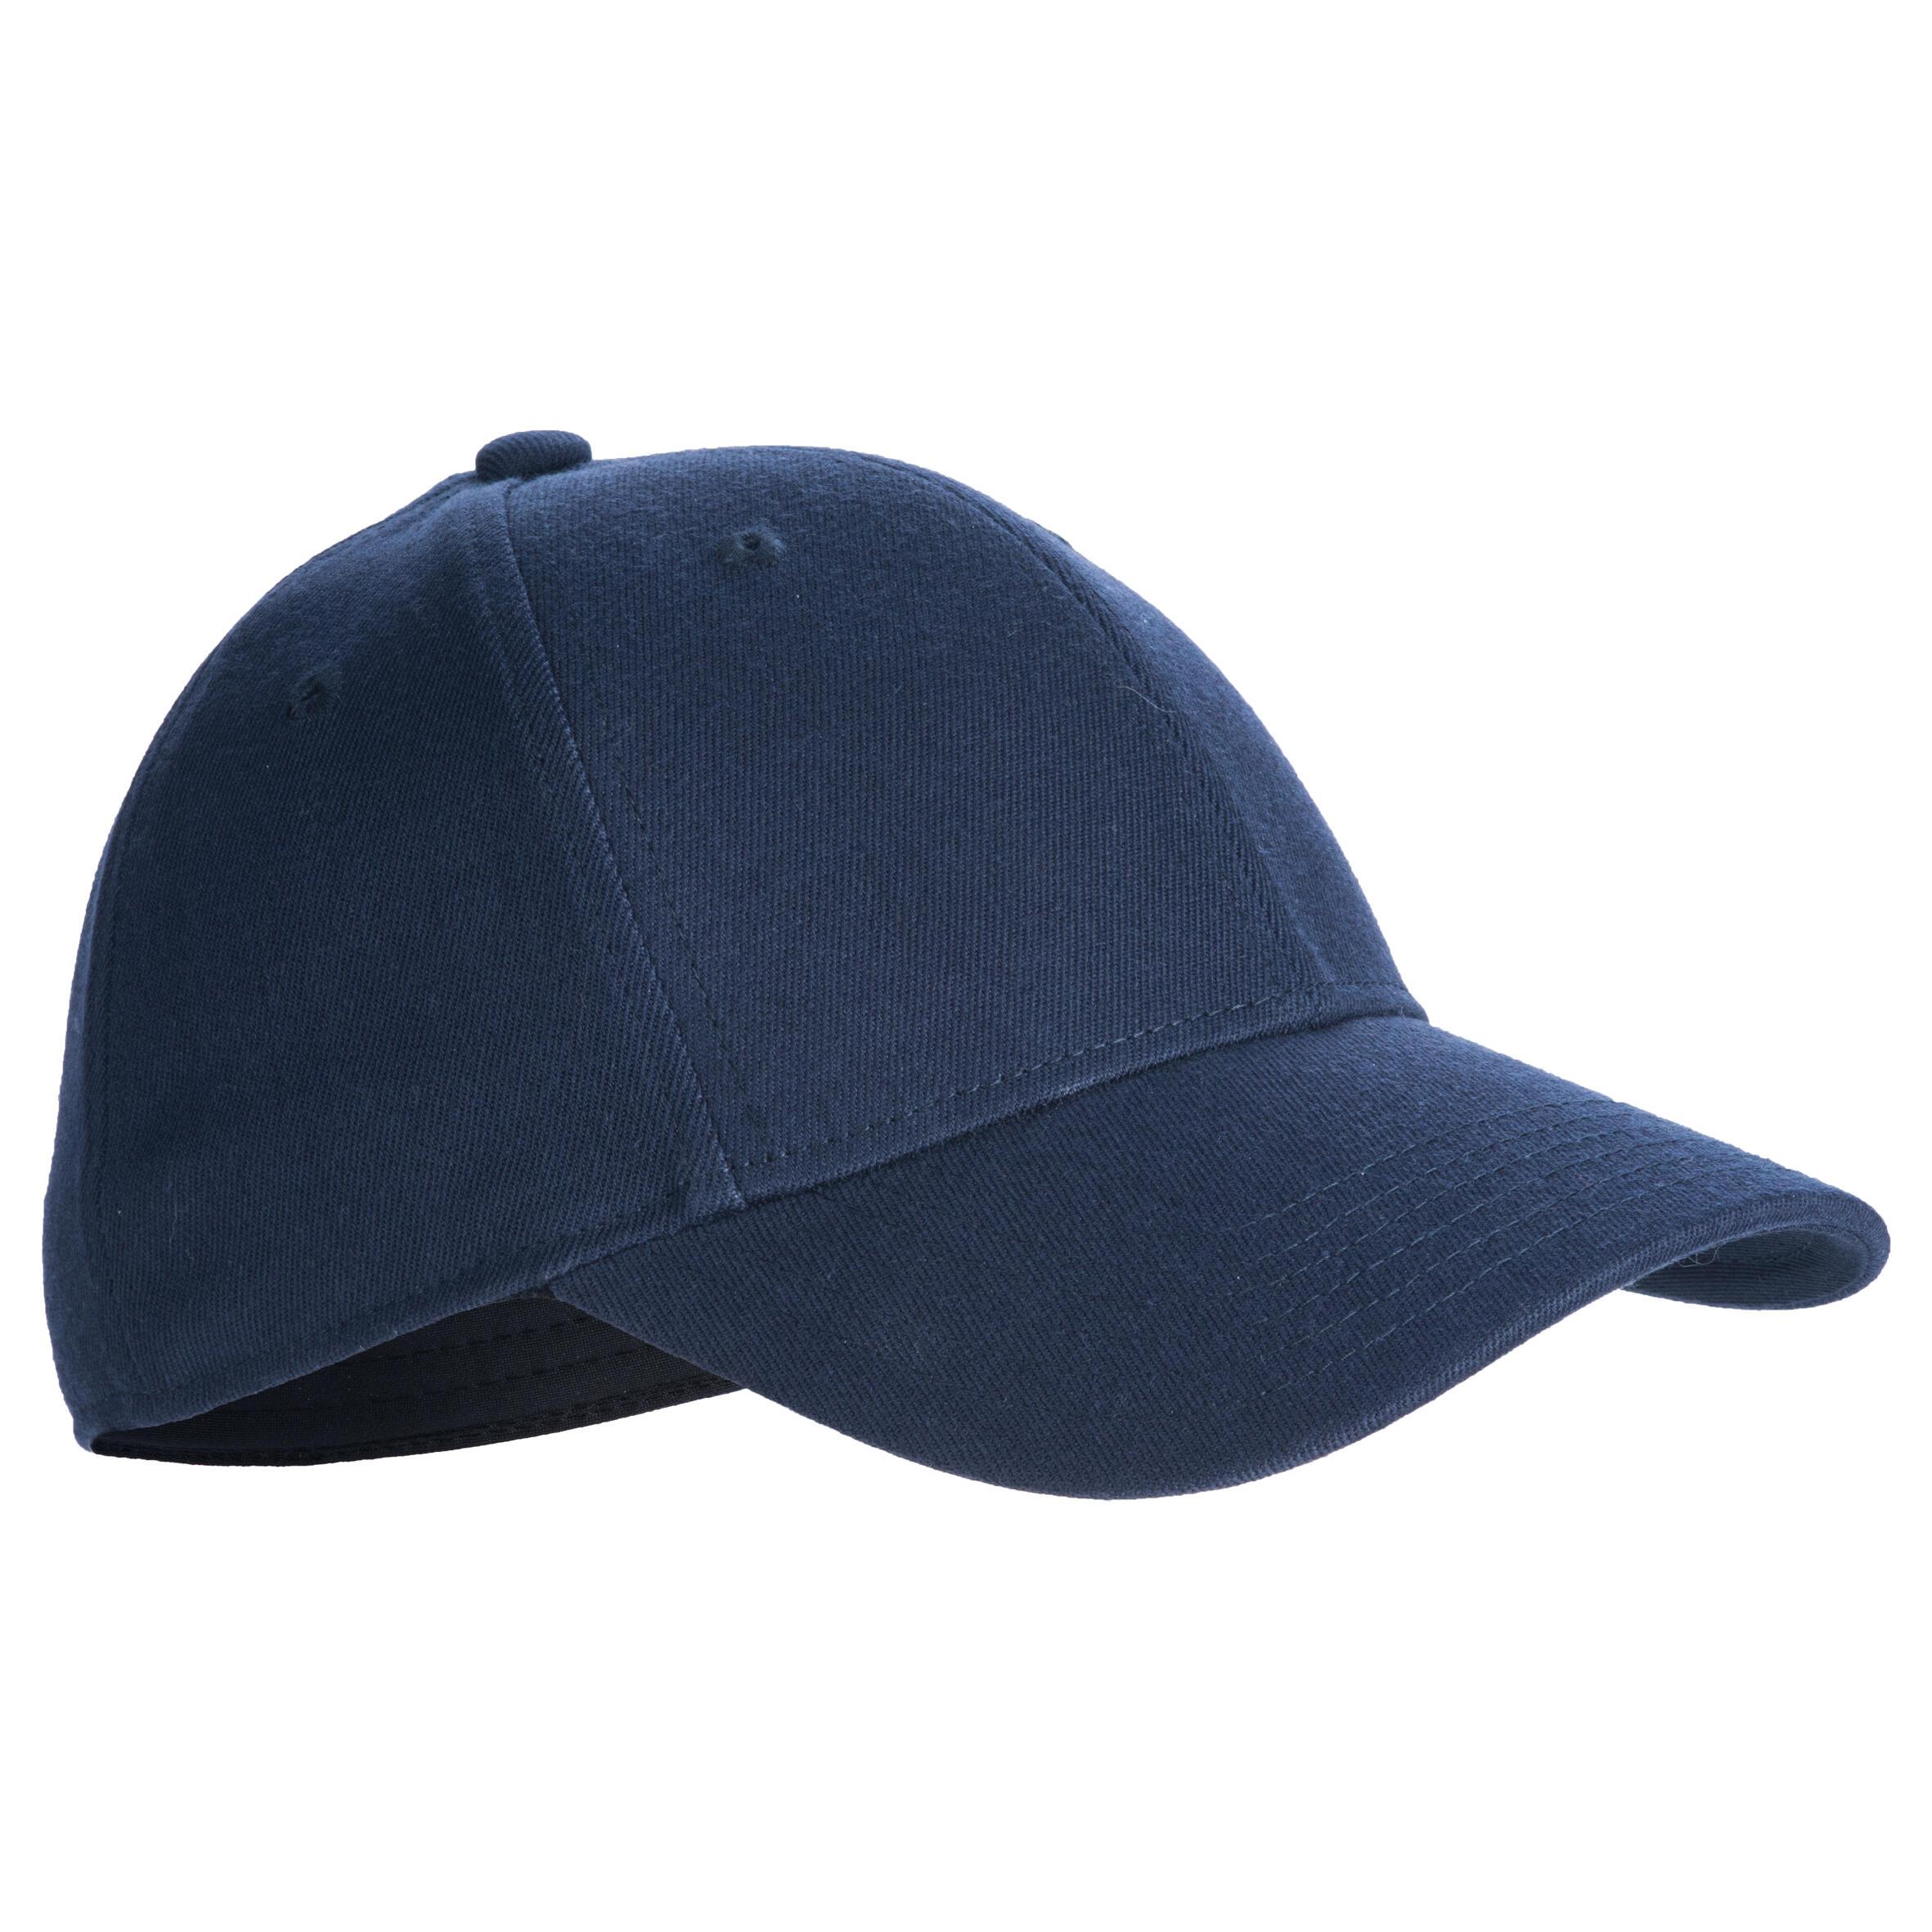 Kipsta Honkbalpet BA 550 blauw